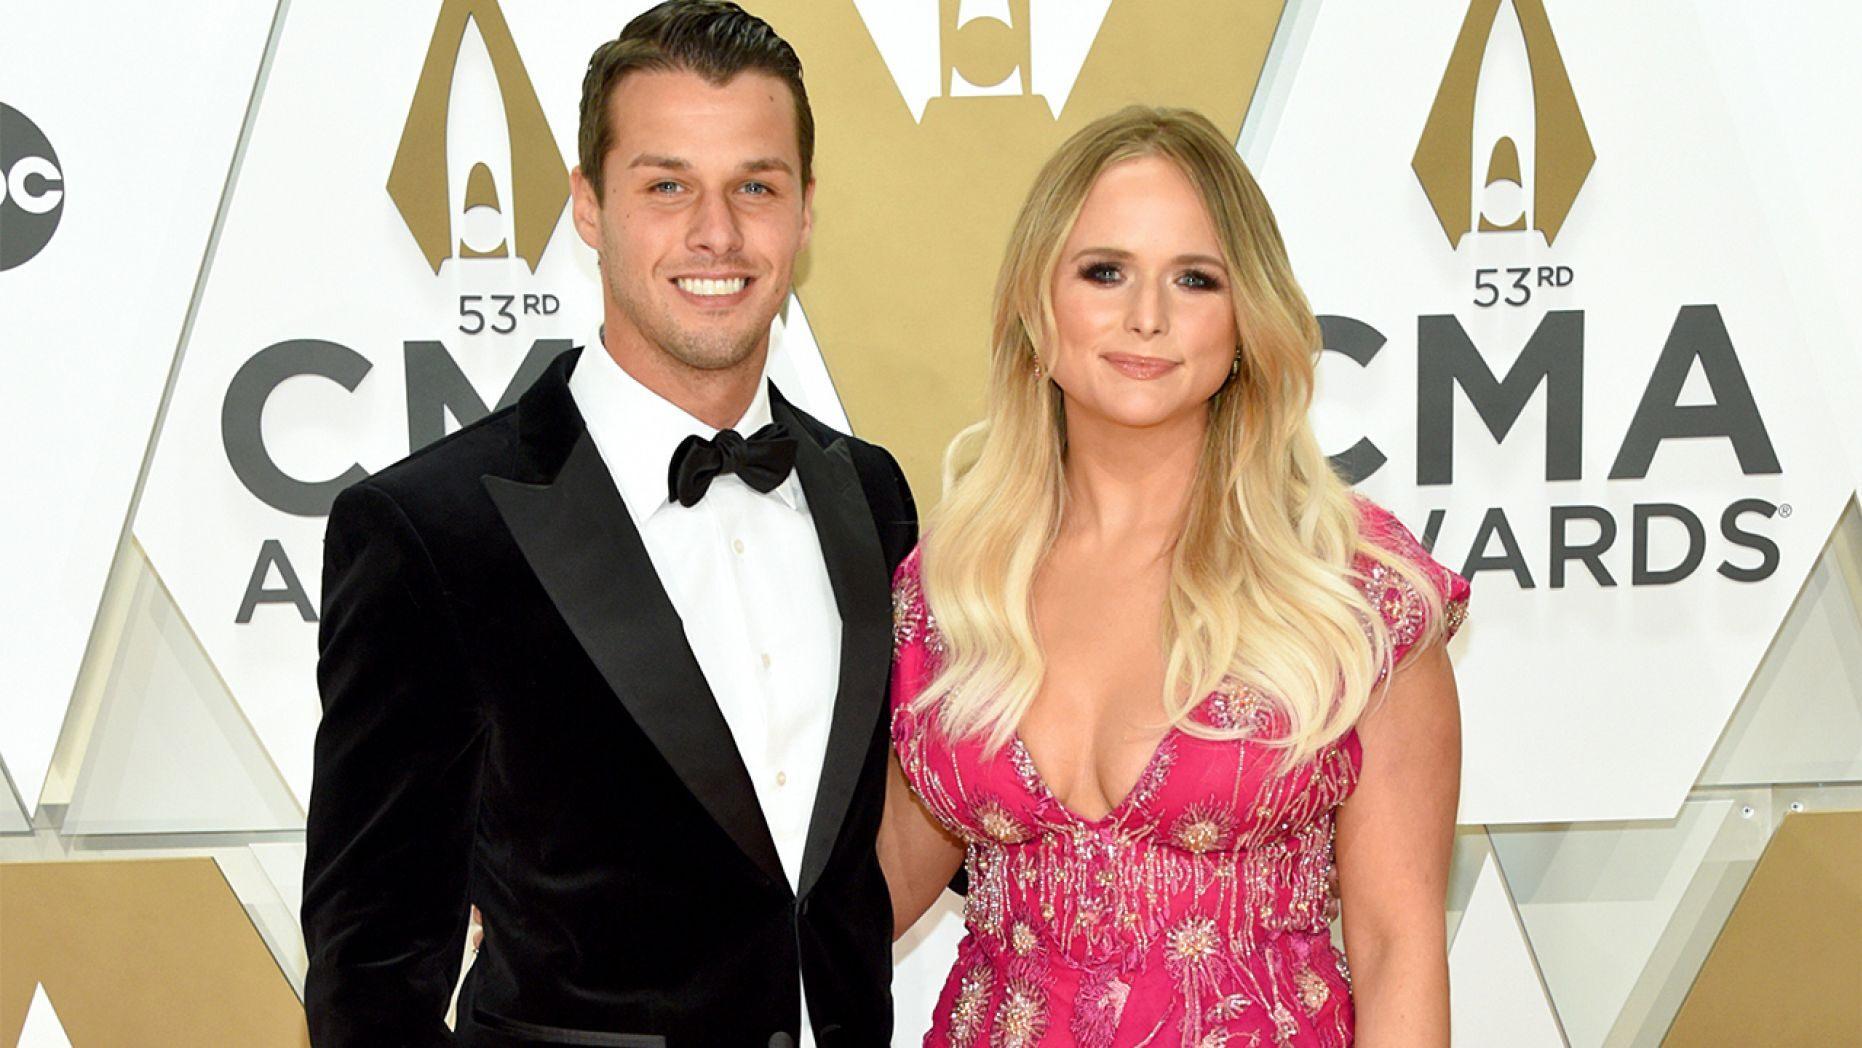 Miranda Lambert applauds Carrie Underwoods 'Drinking Alone' performance at 2019 CMAs